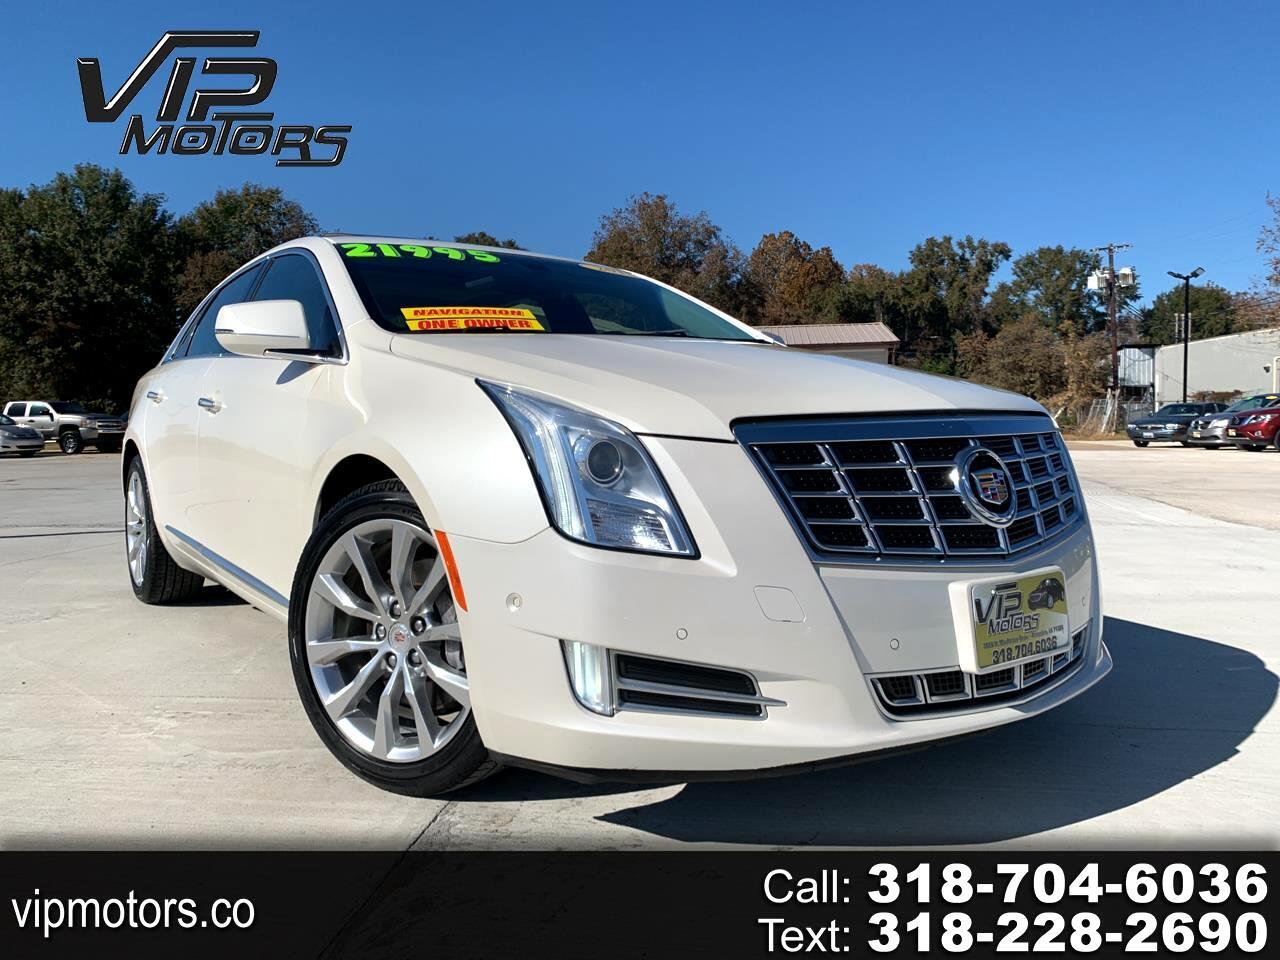 Cadillac XTS 4dr Sdn Luxury FWD 2015